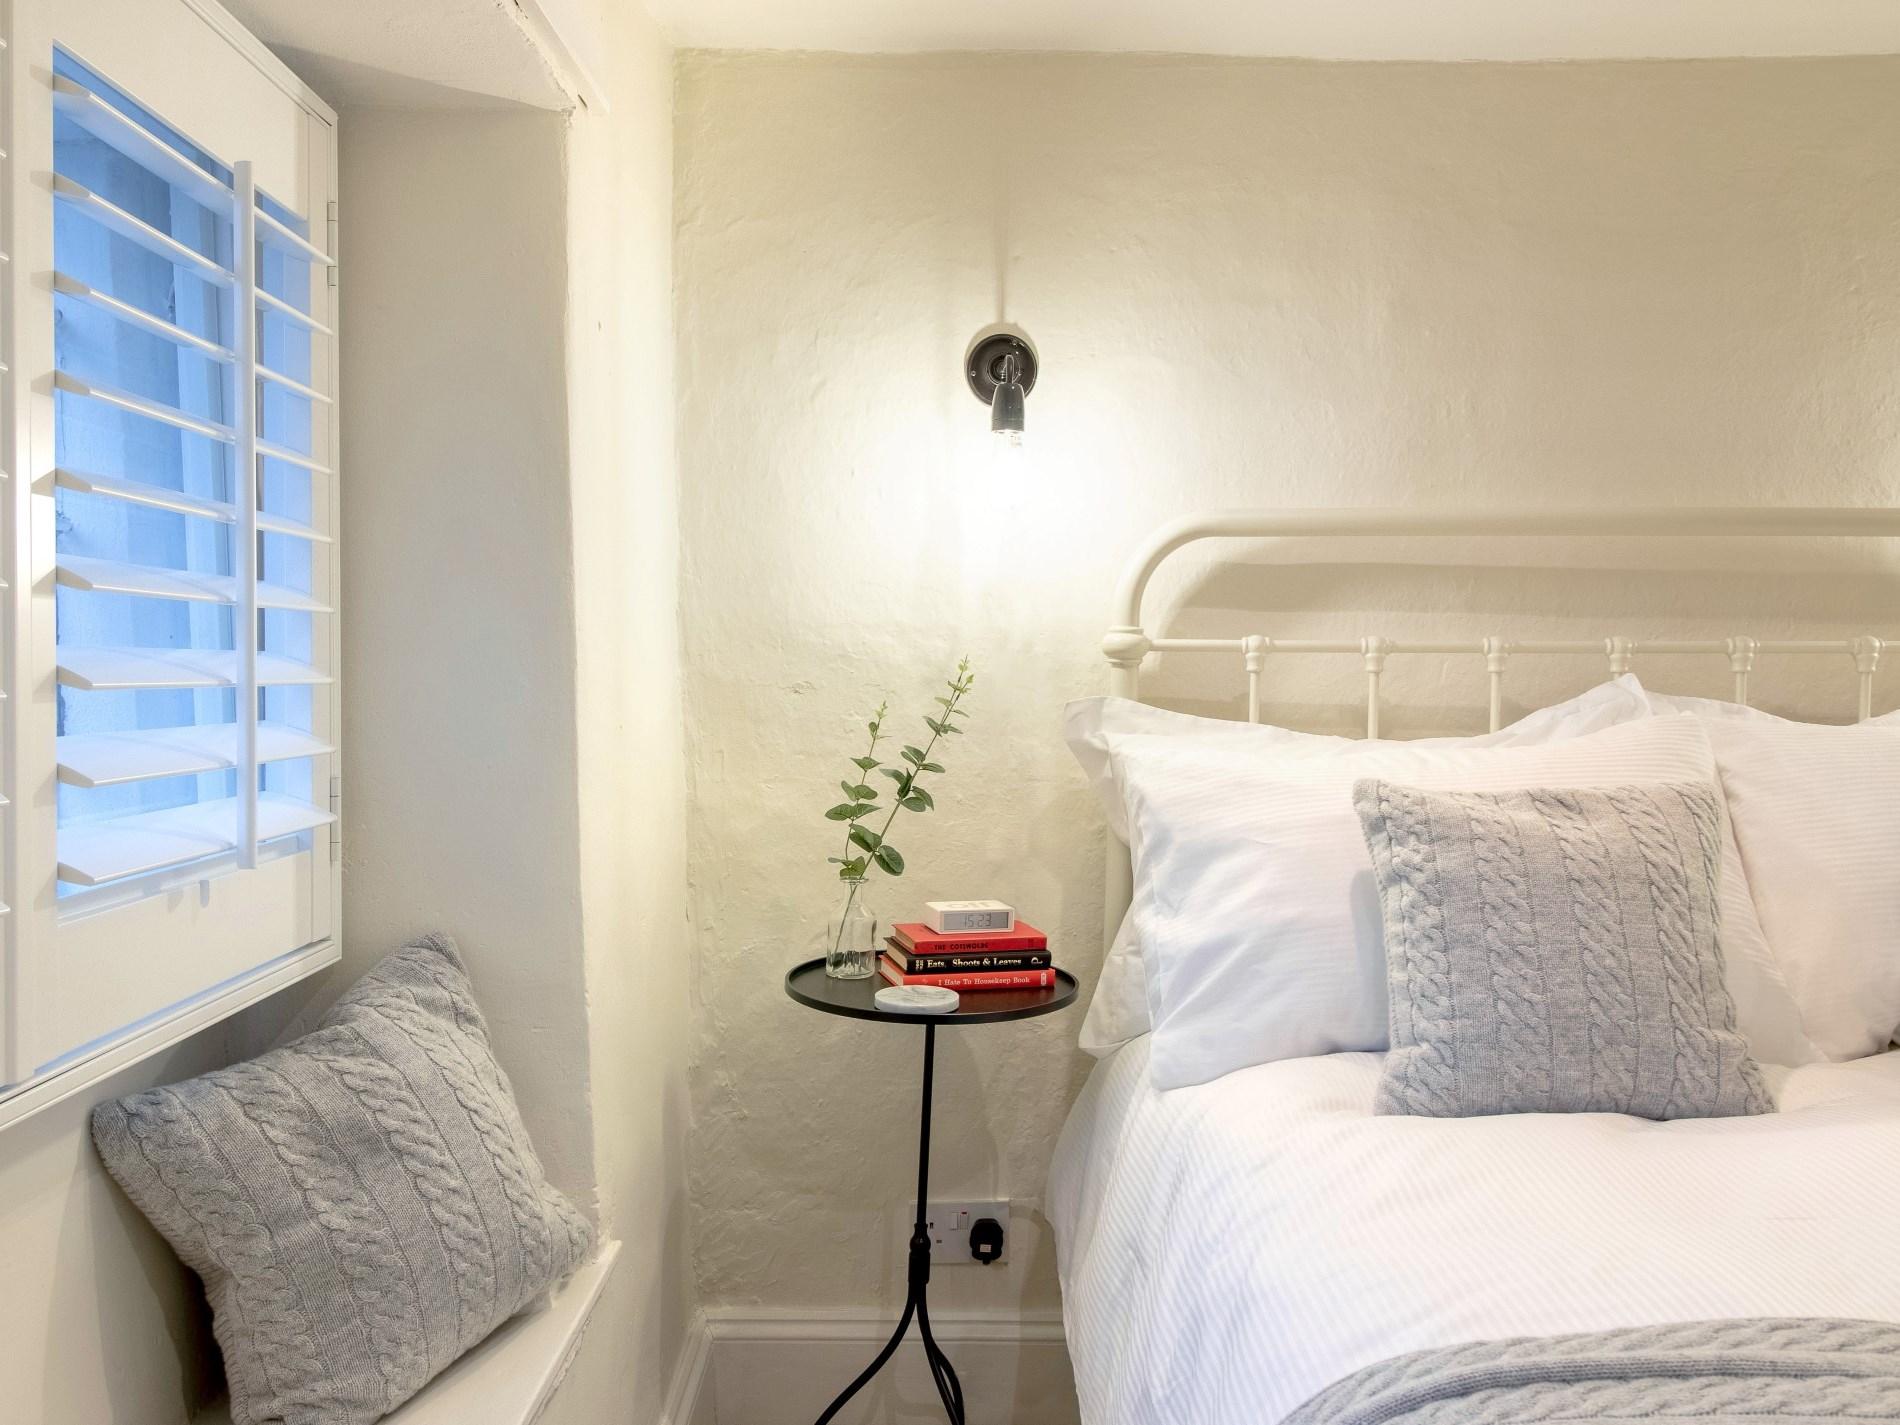 Soft linen and wooden shutters